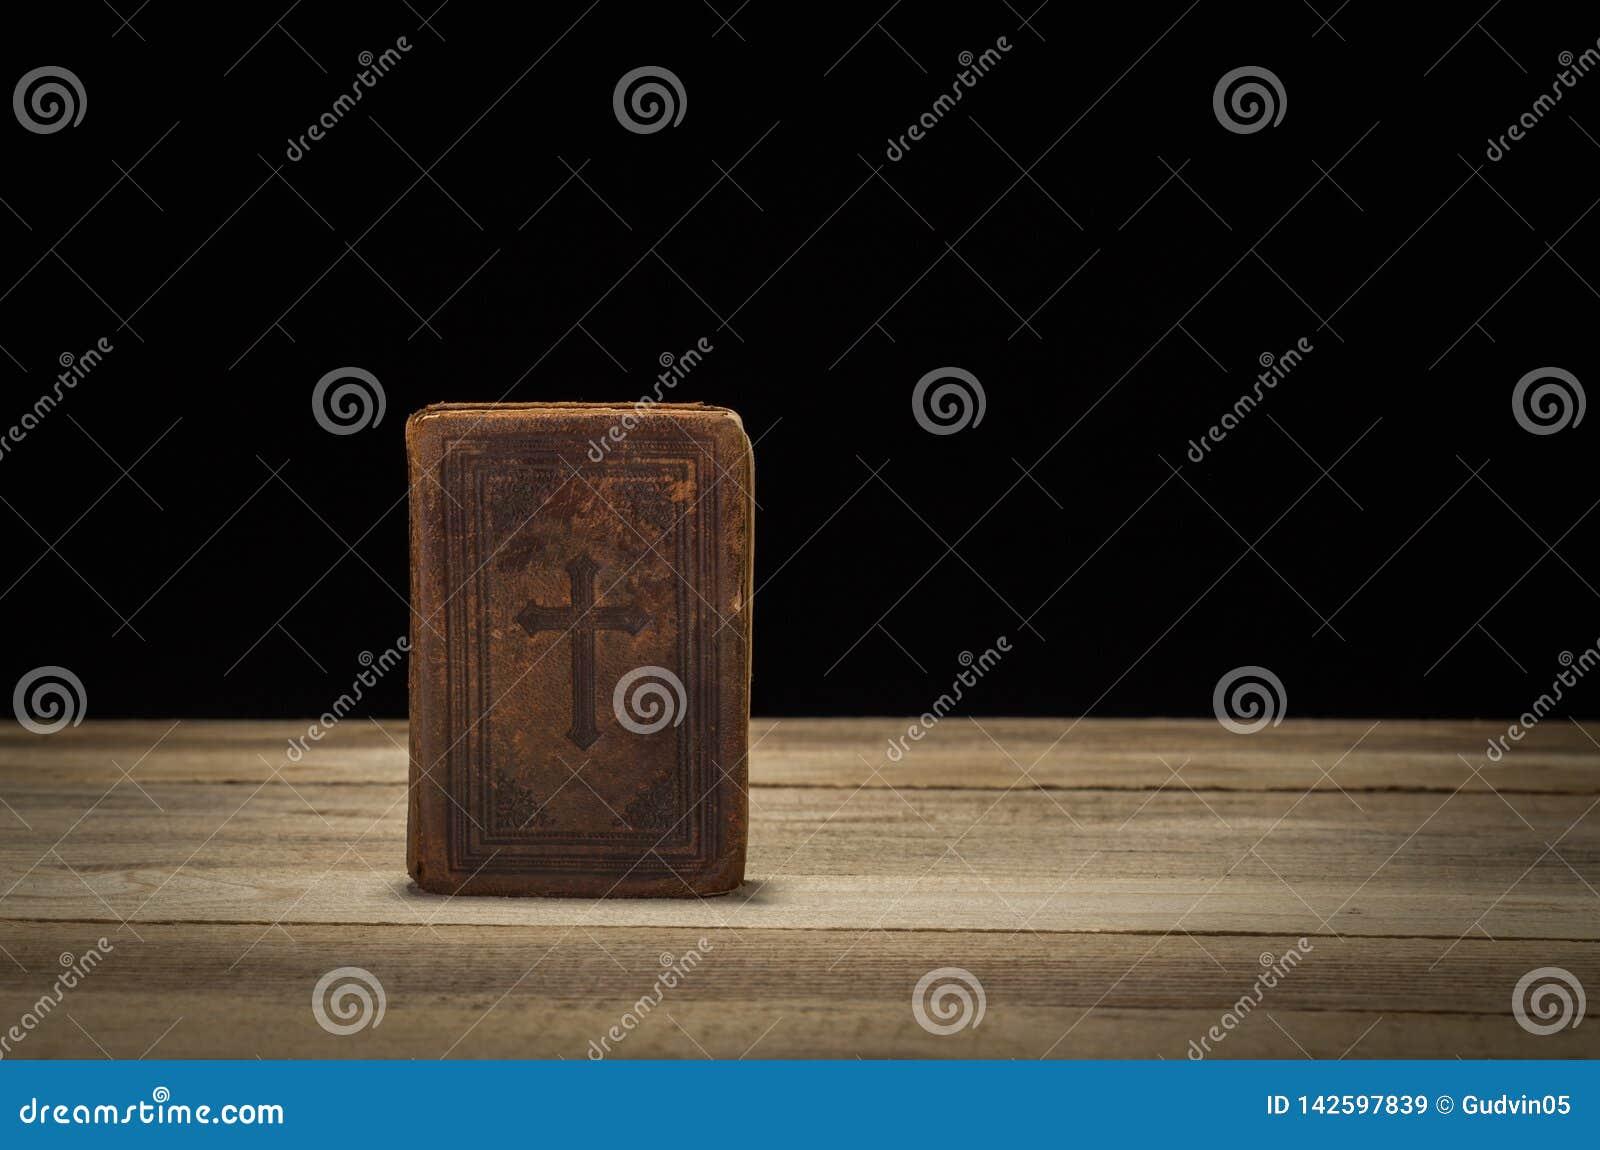 Sagrada Biblia en una tabla enselvada Fondo negro